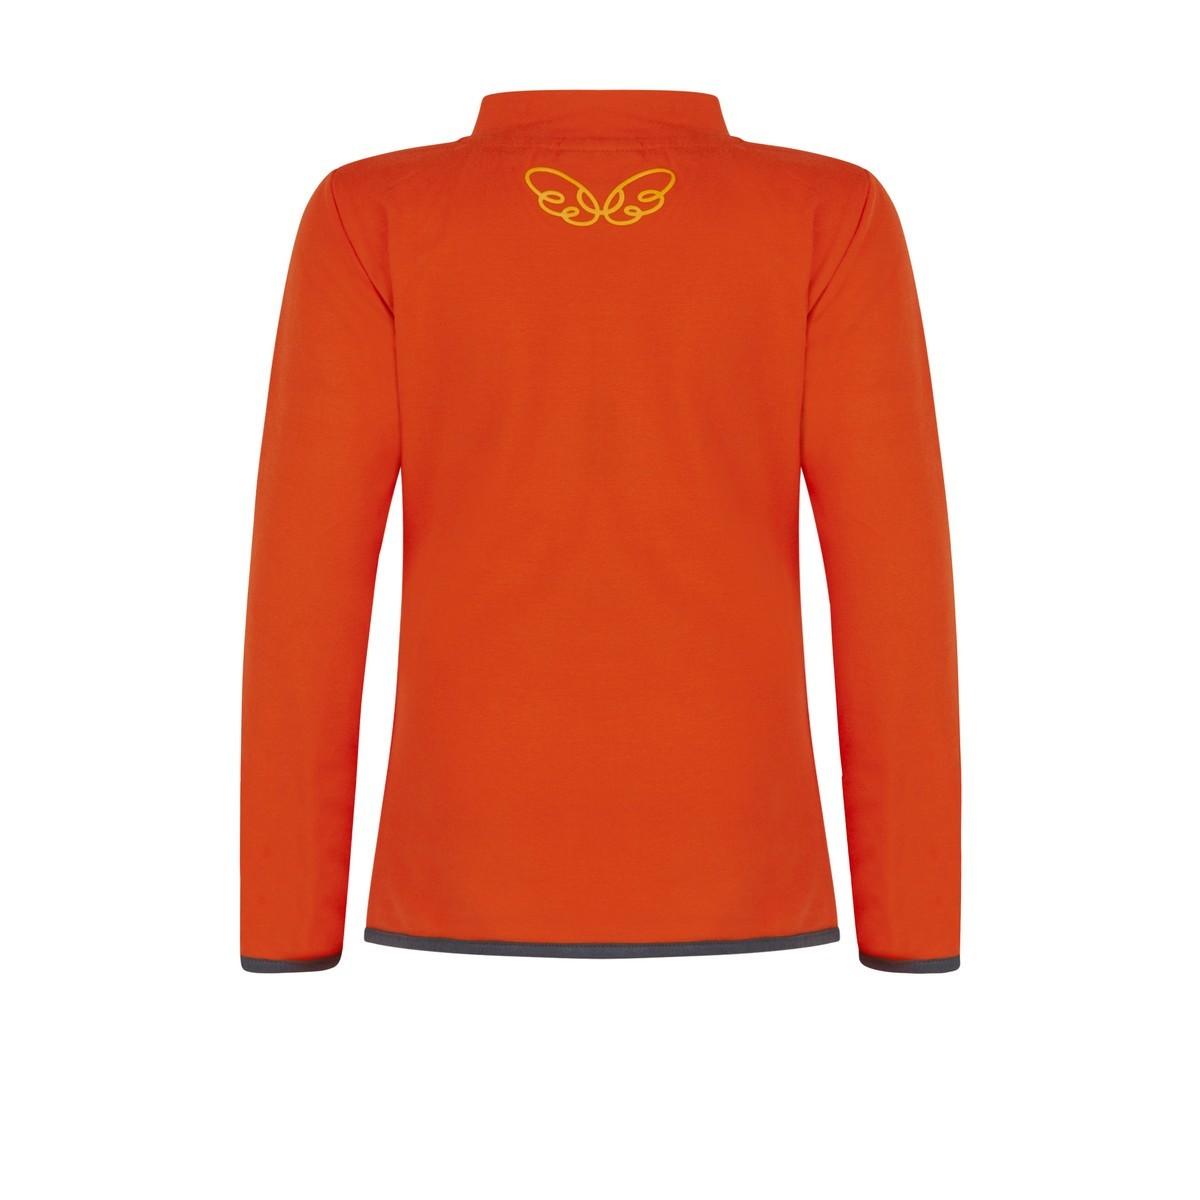 Ninni Vi longsleeve orange (NVFW18-09)